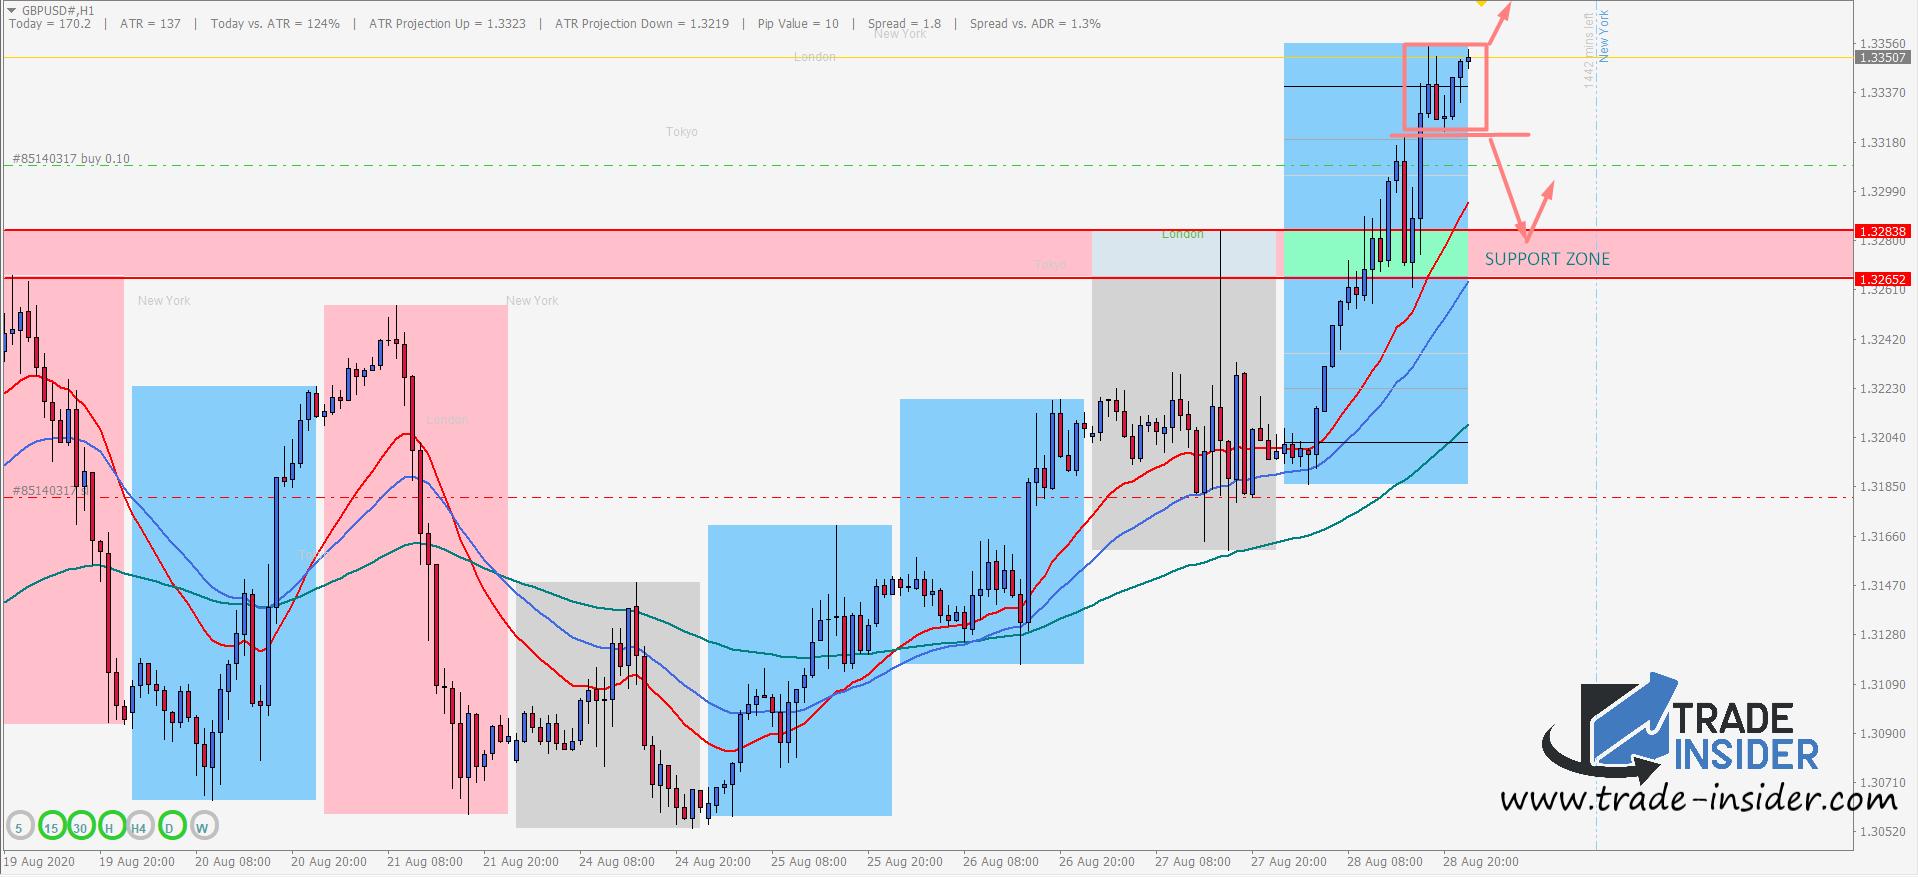 GBPUSD H1 Chart Setup